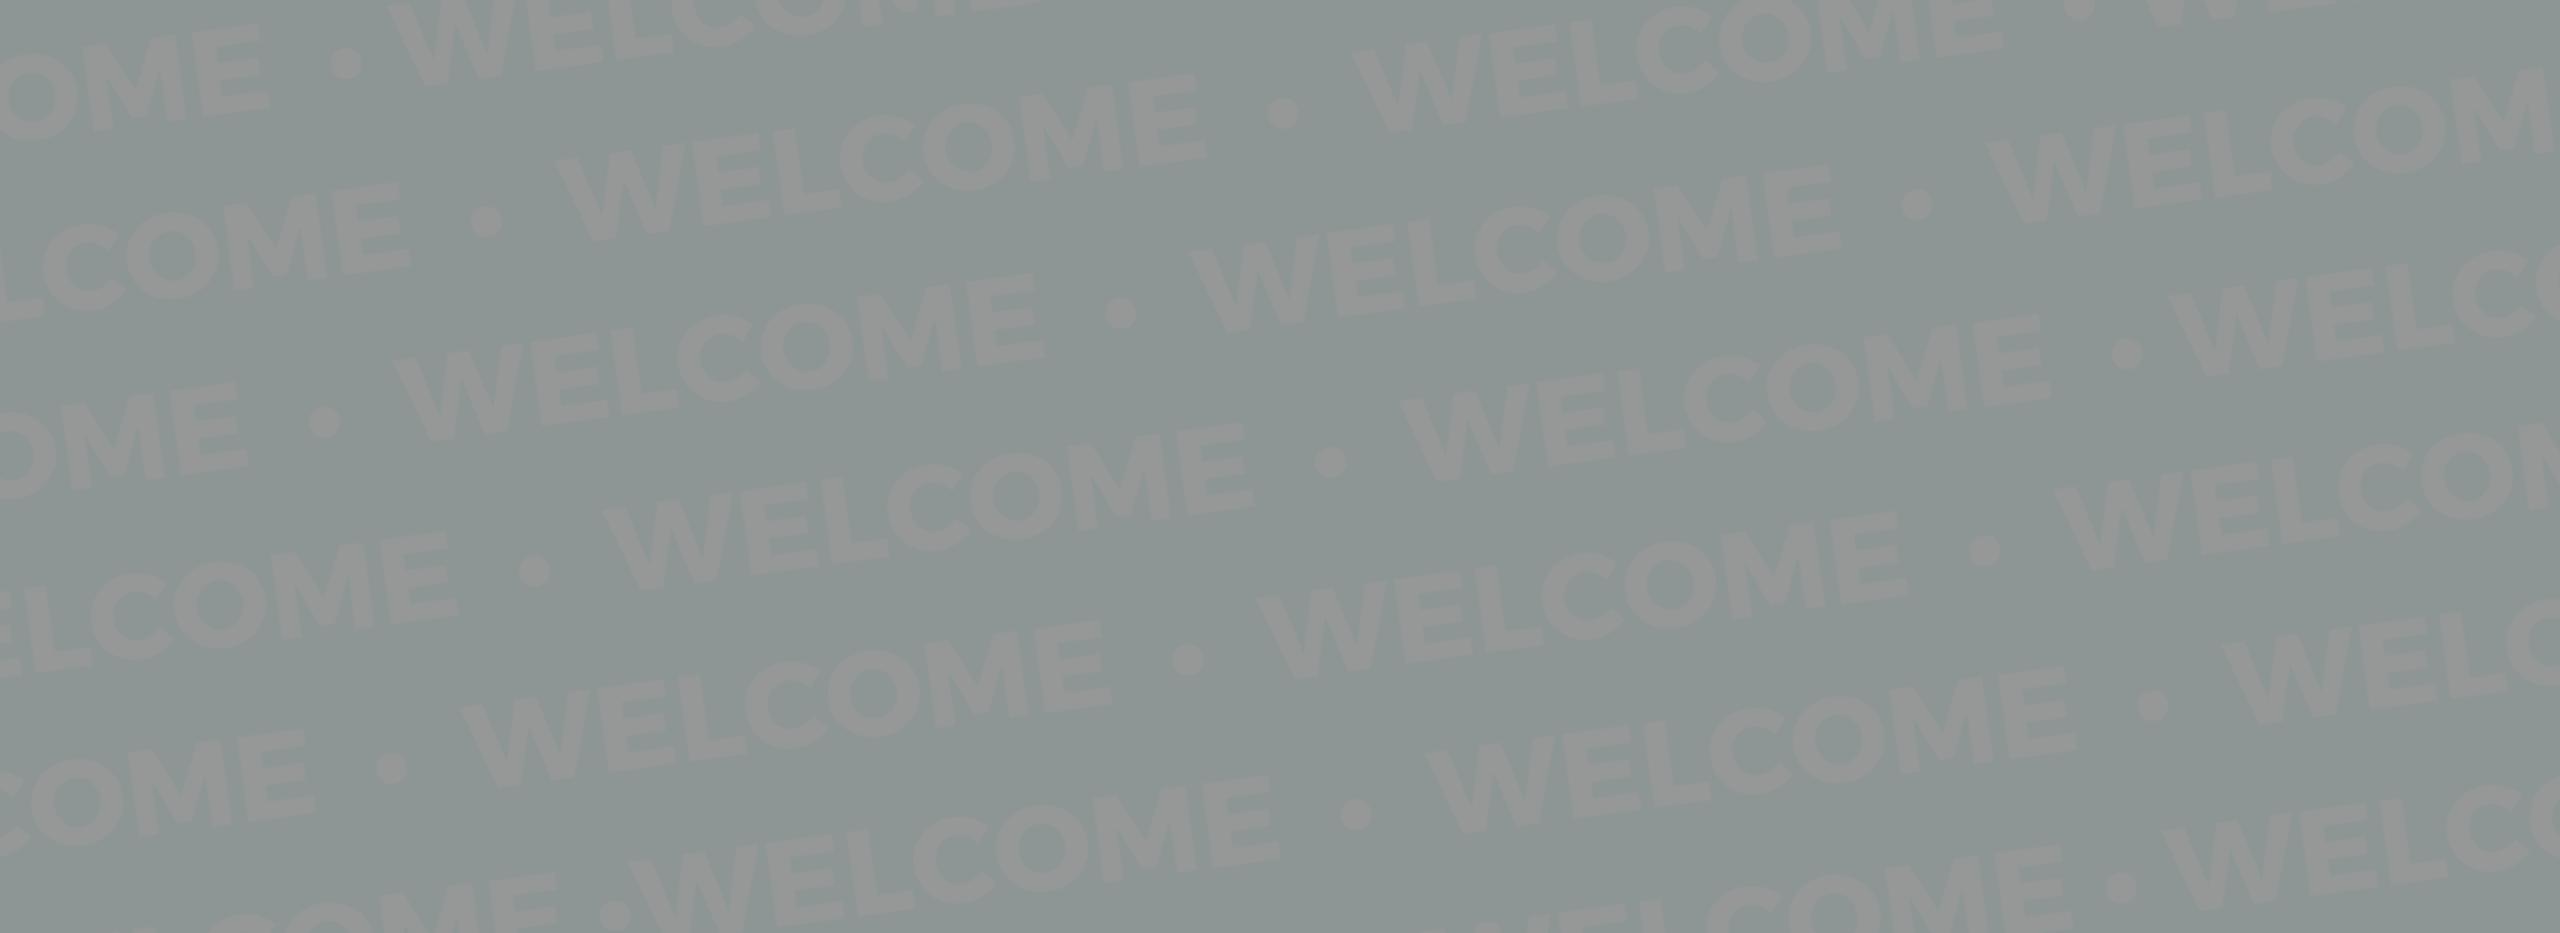 MRE | AP Welcomes Office & Communications Coordinator Alie Reighard